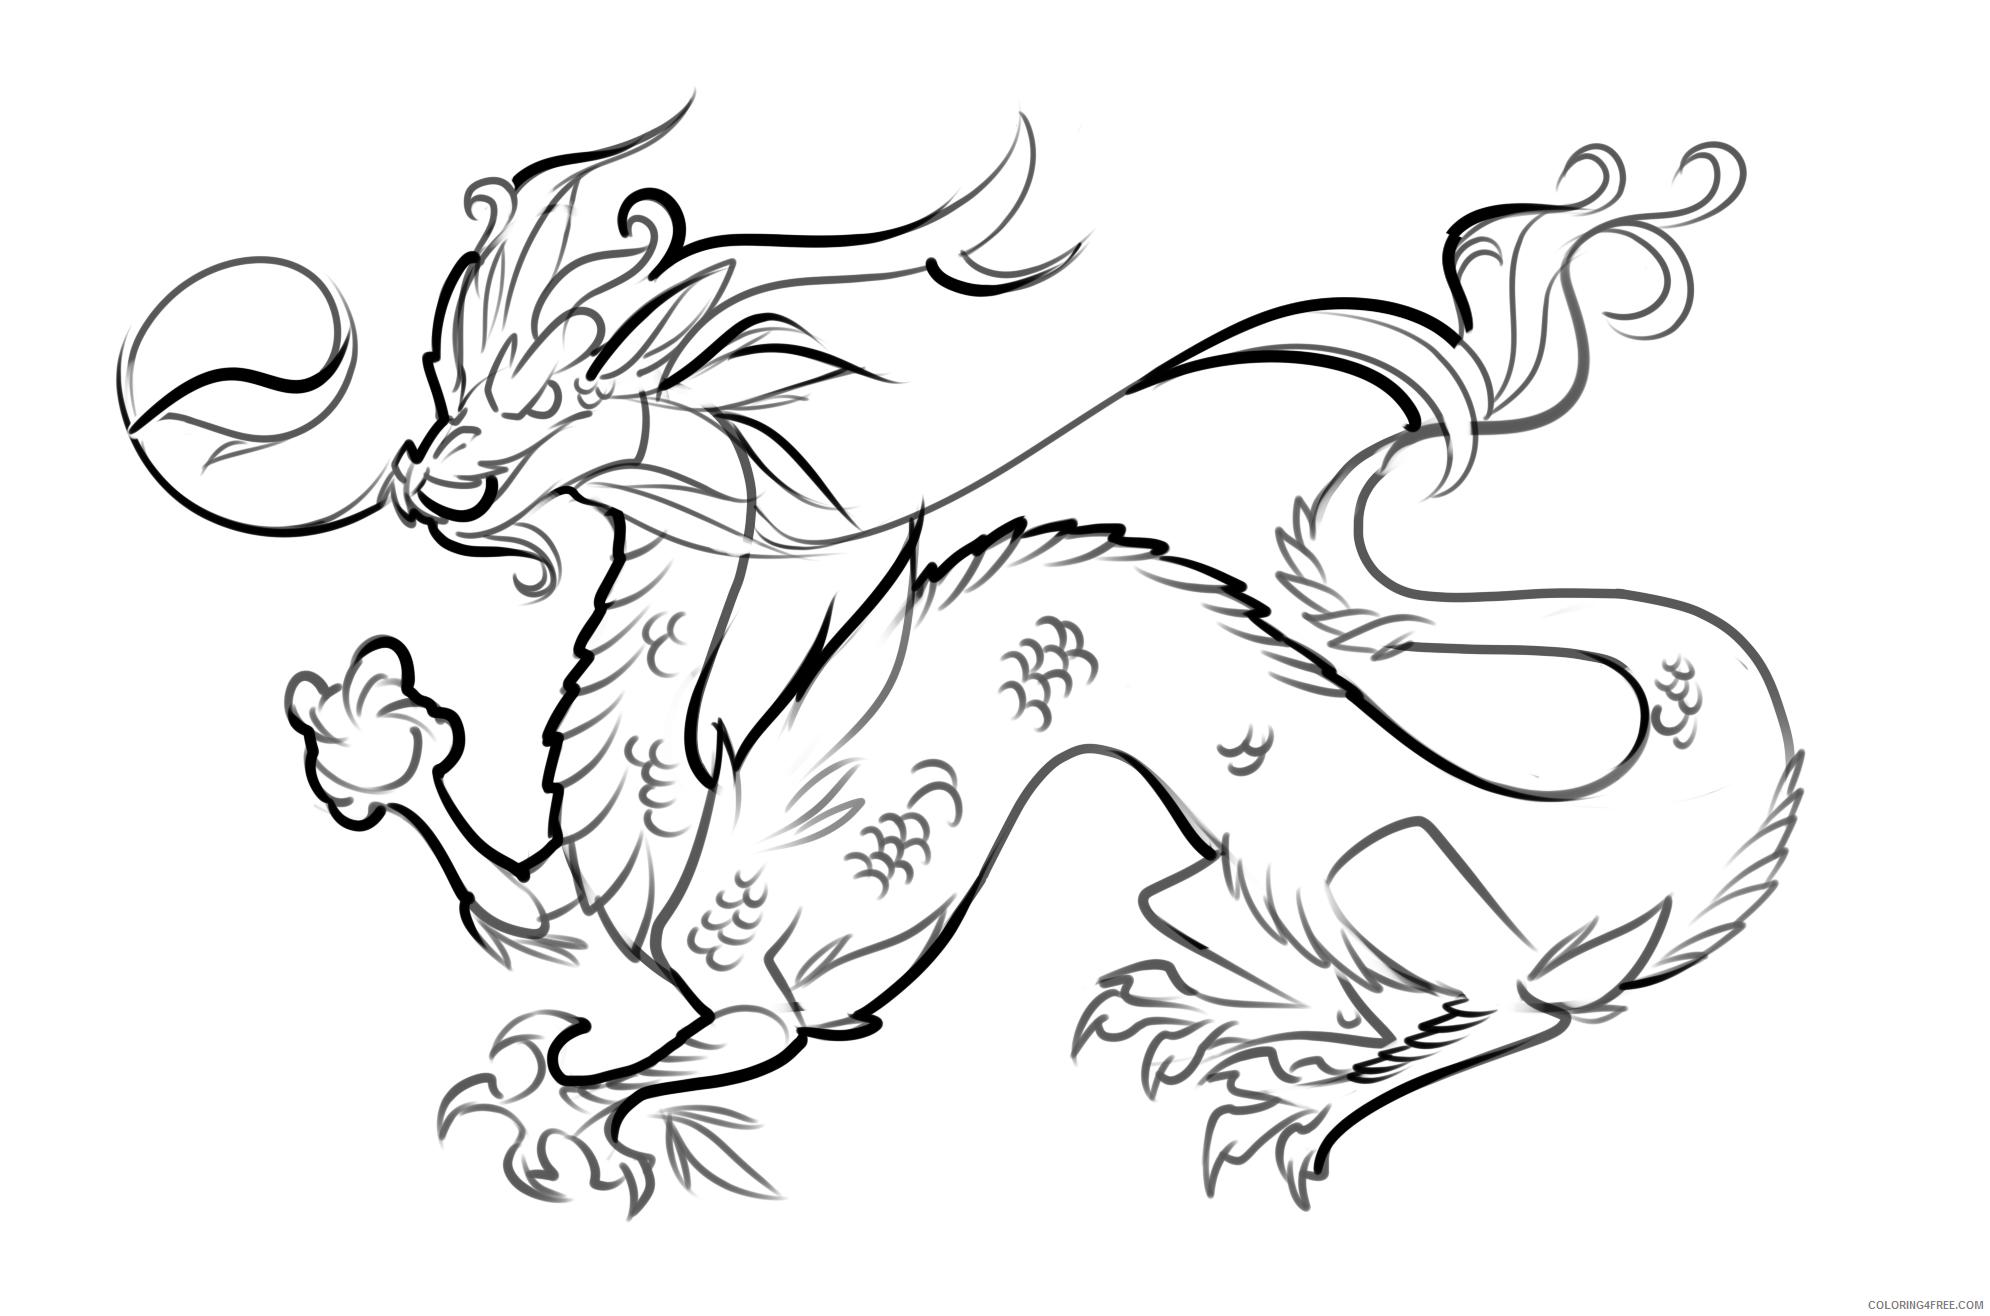 Fantasy Dragons Coloring Pages Japanese Dragon Printable 2021 2593 Coloring4free